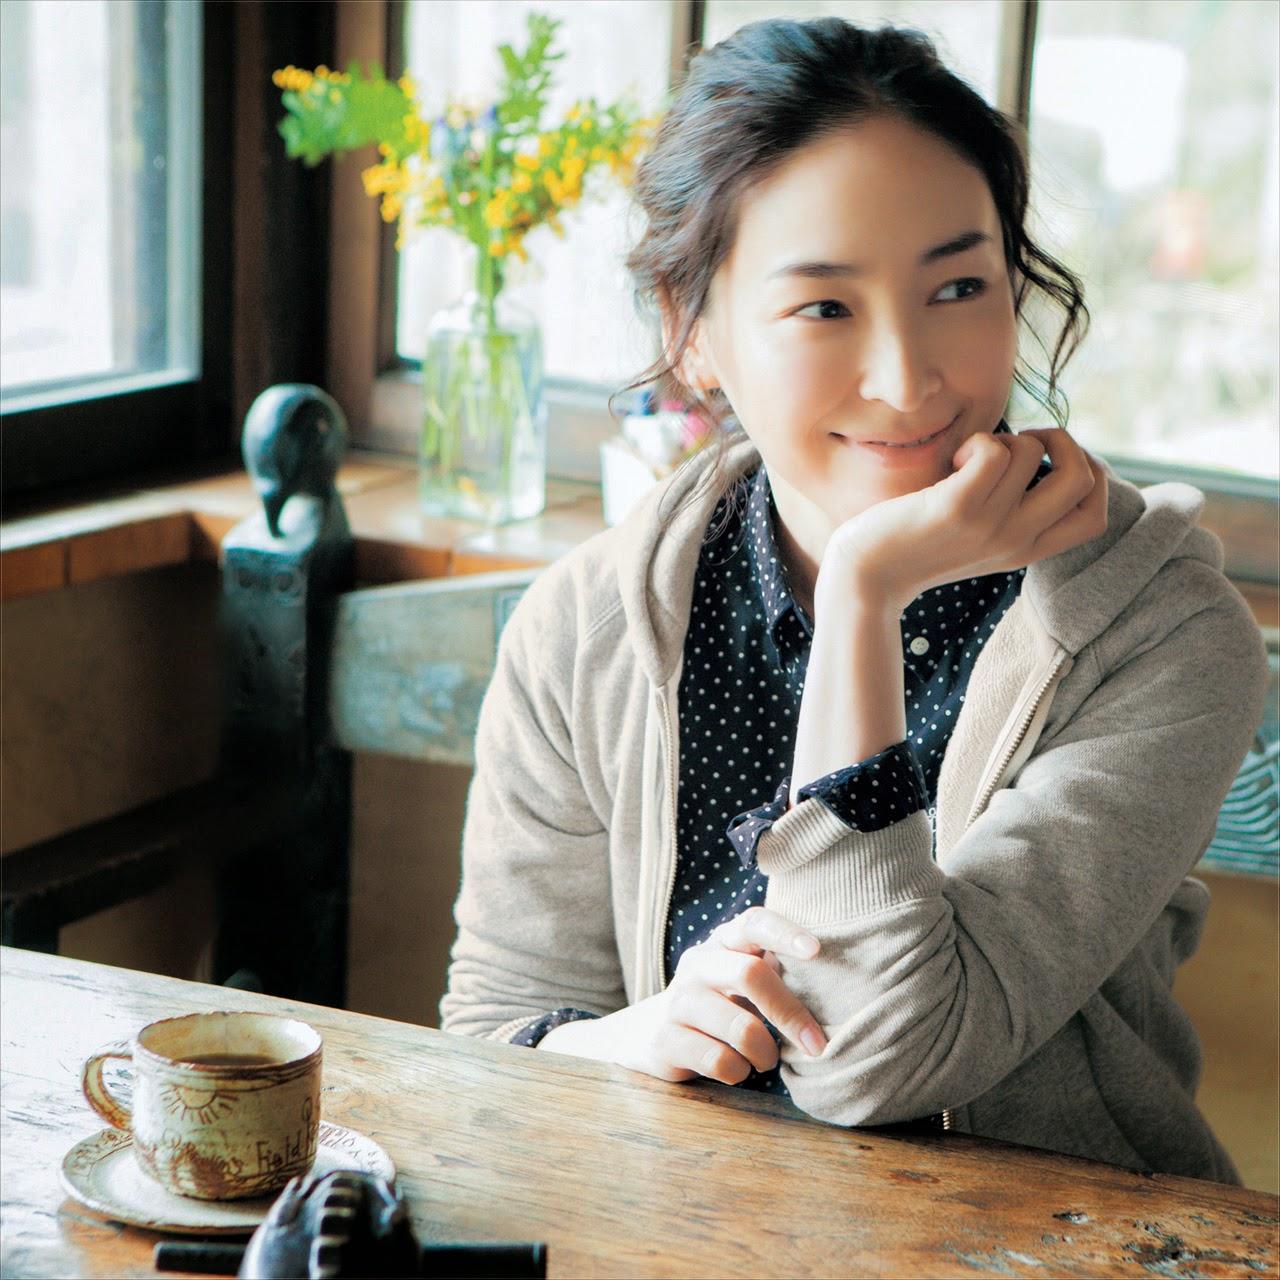 Forum on this topic: Kirsten Gronfield, kumiko-aso/